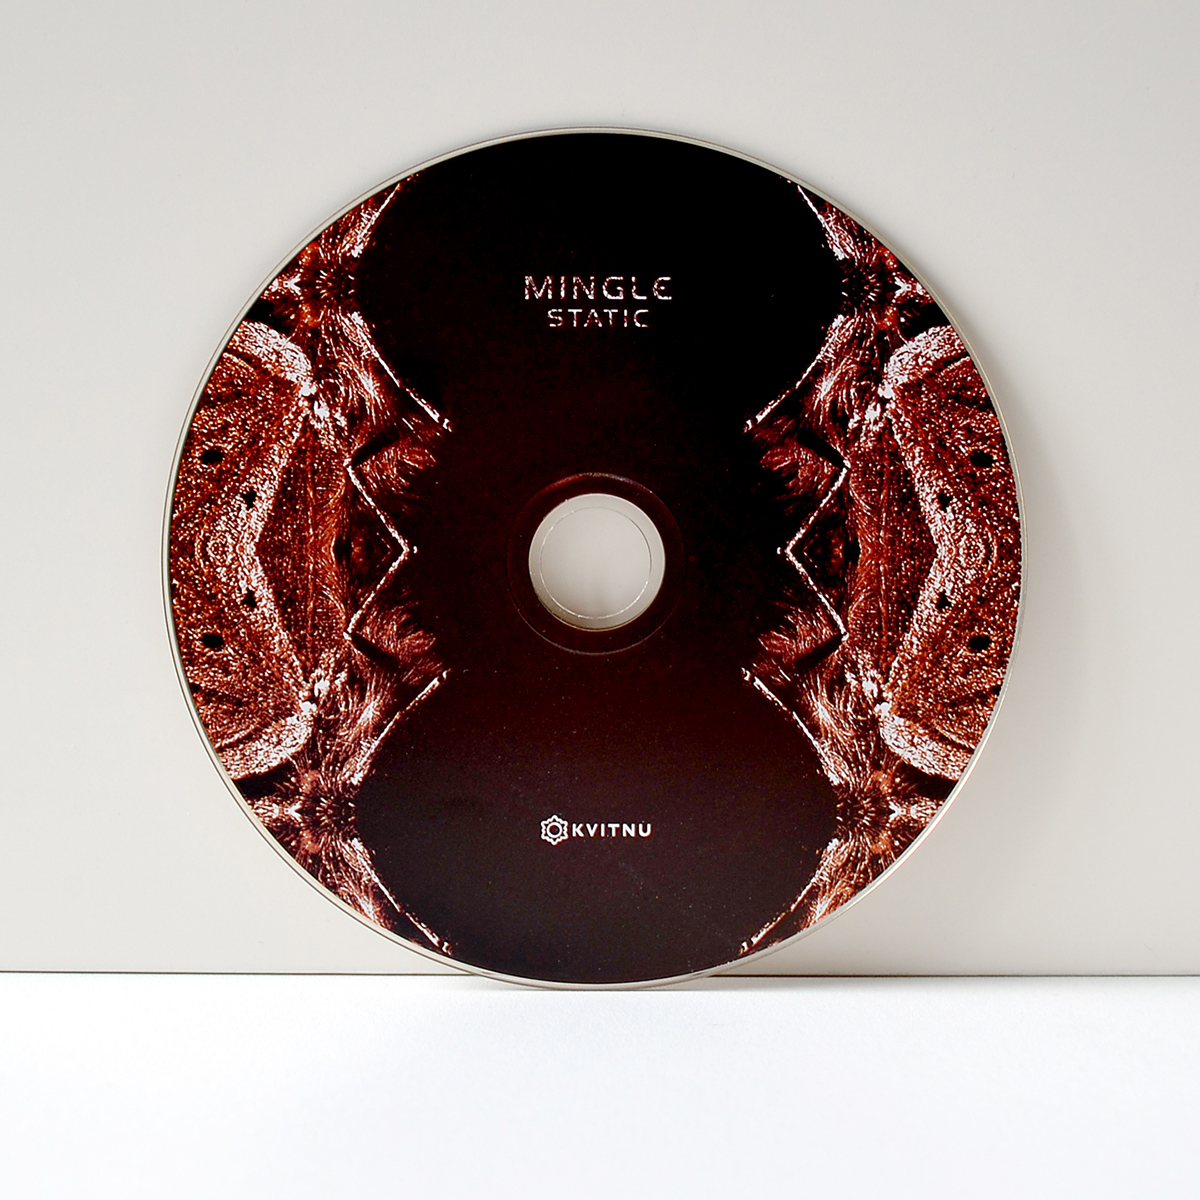 Mingle static Zavoloka Kvitnu experimental music cover design electronica